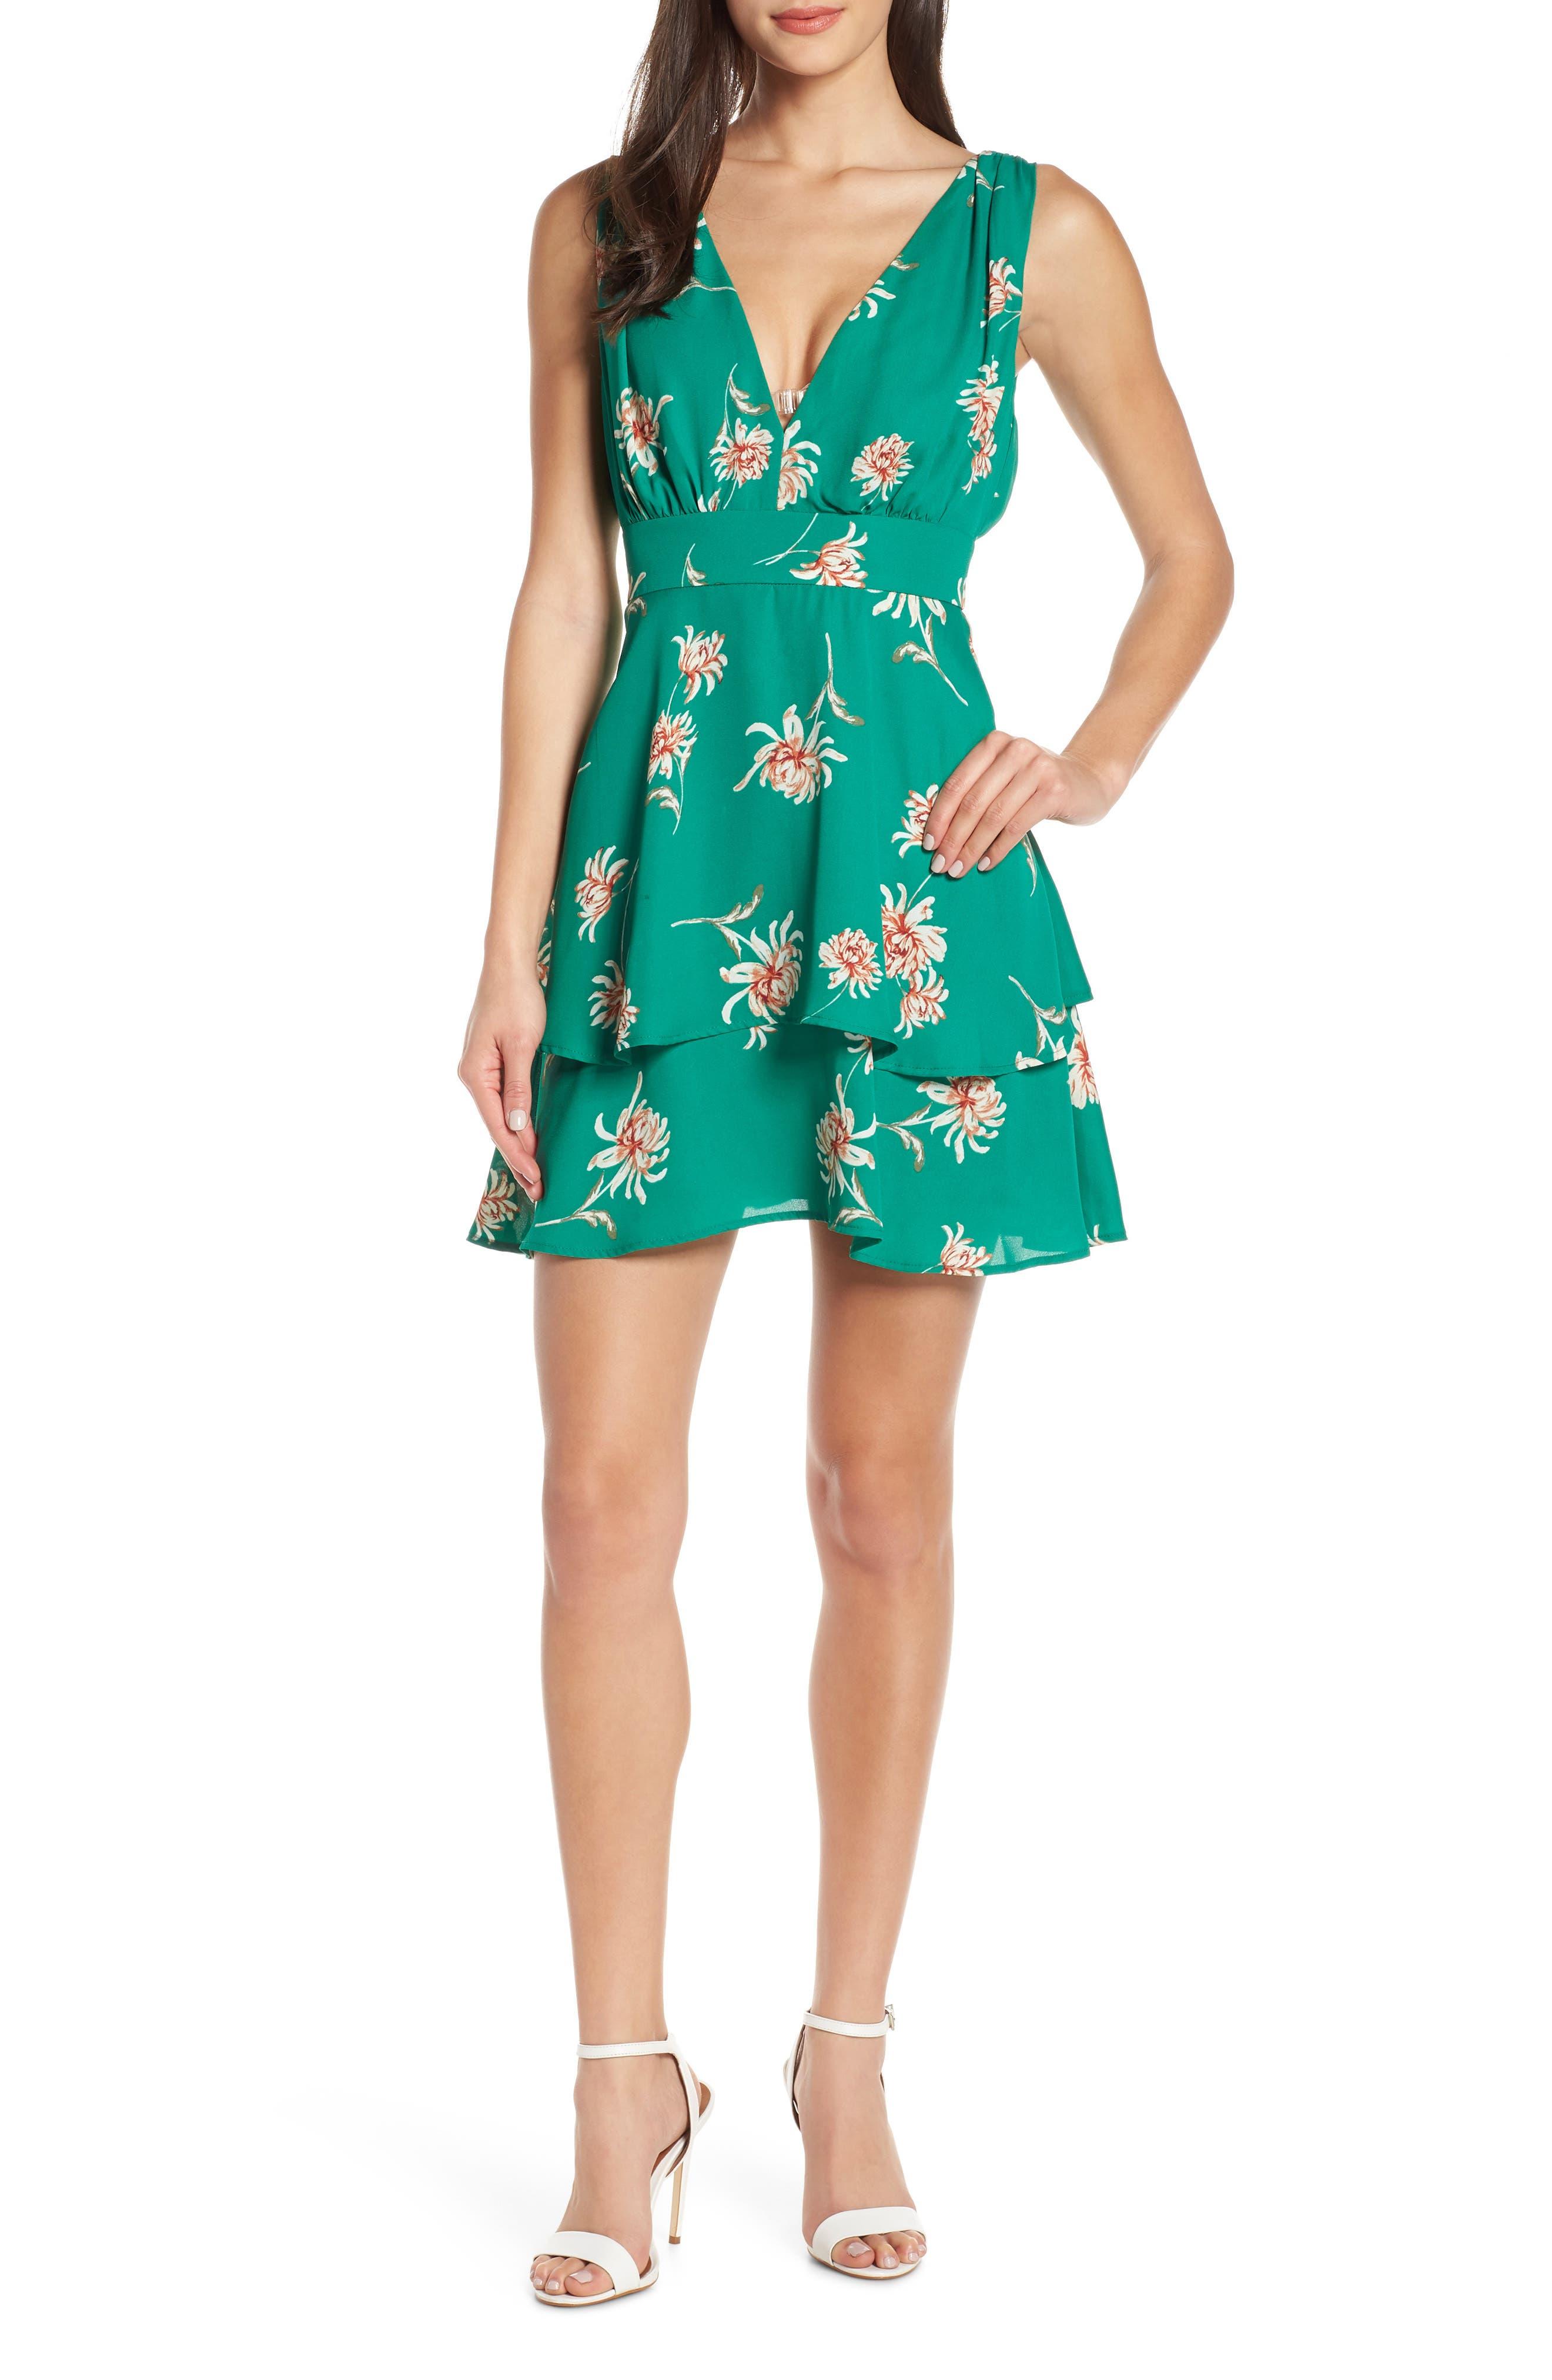 BB DAKOTA, Garden Strolls Blossom Party Minidress, Main thumbnail 1, color, PEPPER GREEN